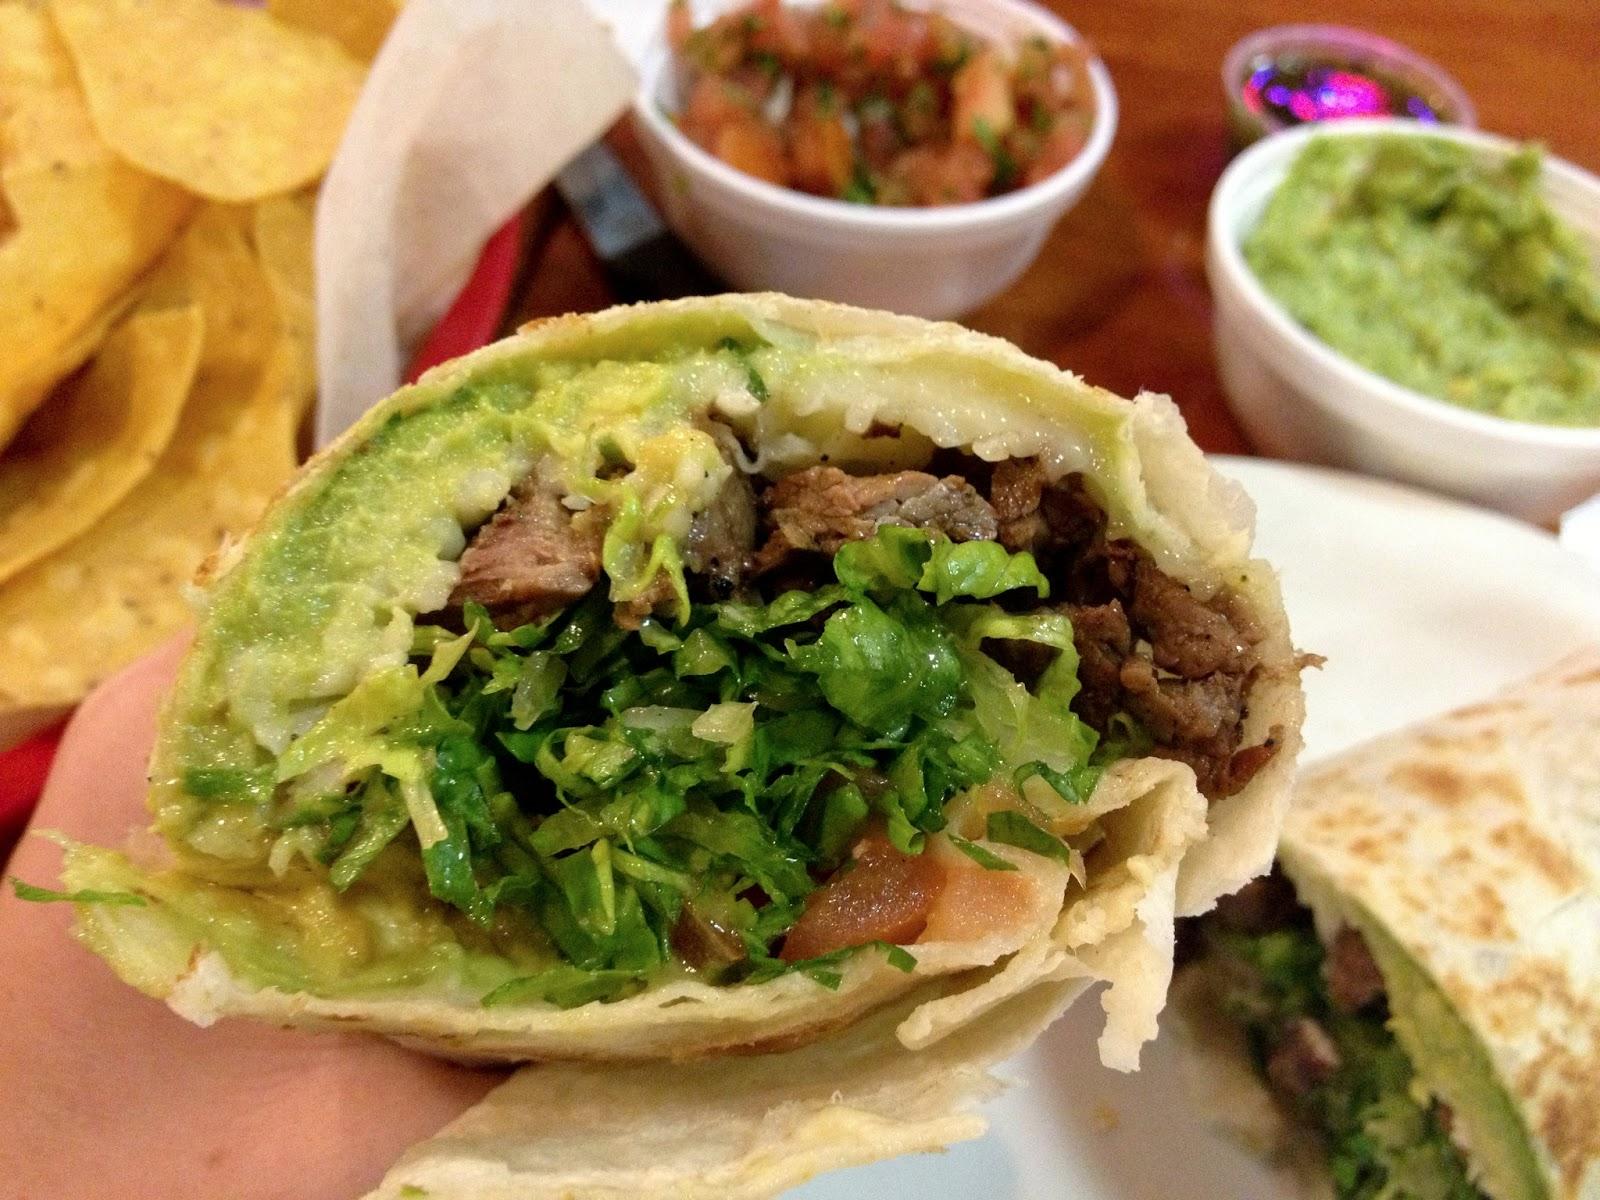 food blog, food blogger,  california, places to eat in california, steak, mexican food, fresh food, chips and salsa, guacamole,baja, baja fish tacos, carne asada, burrito